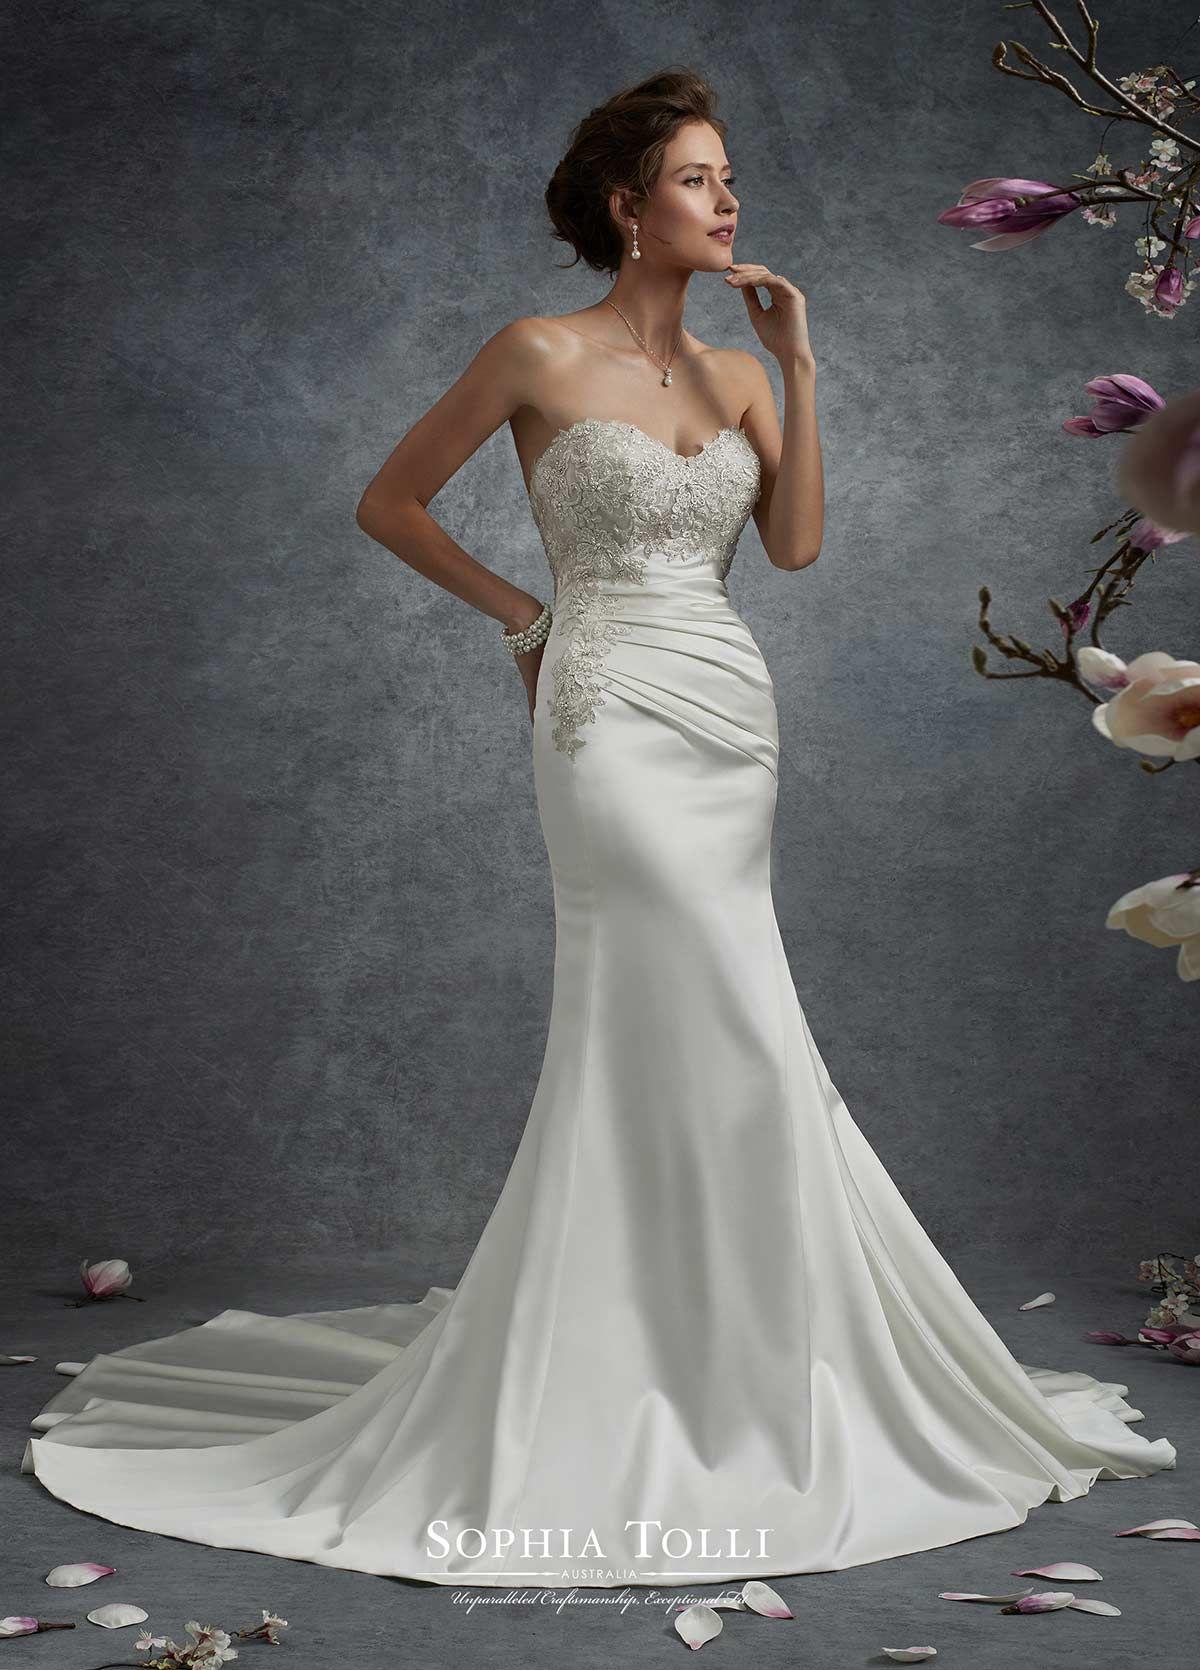 Sophia Tolli Y21744   Sophia Tolli   Wedding time   Pinterest ...